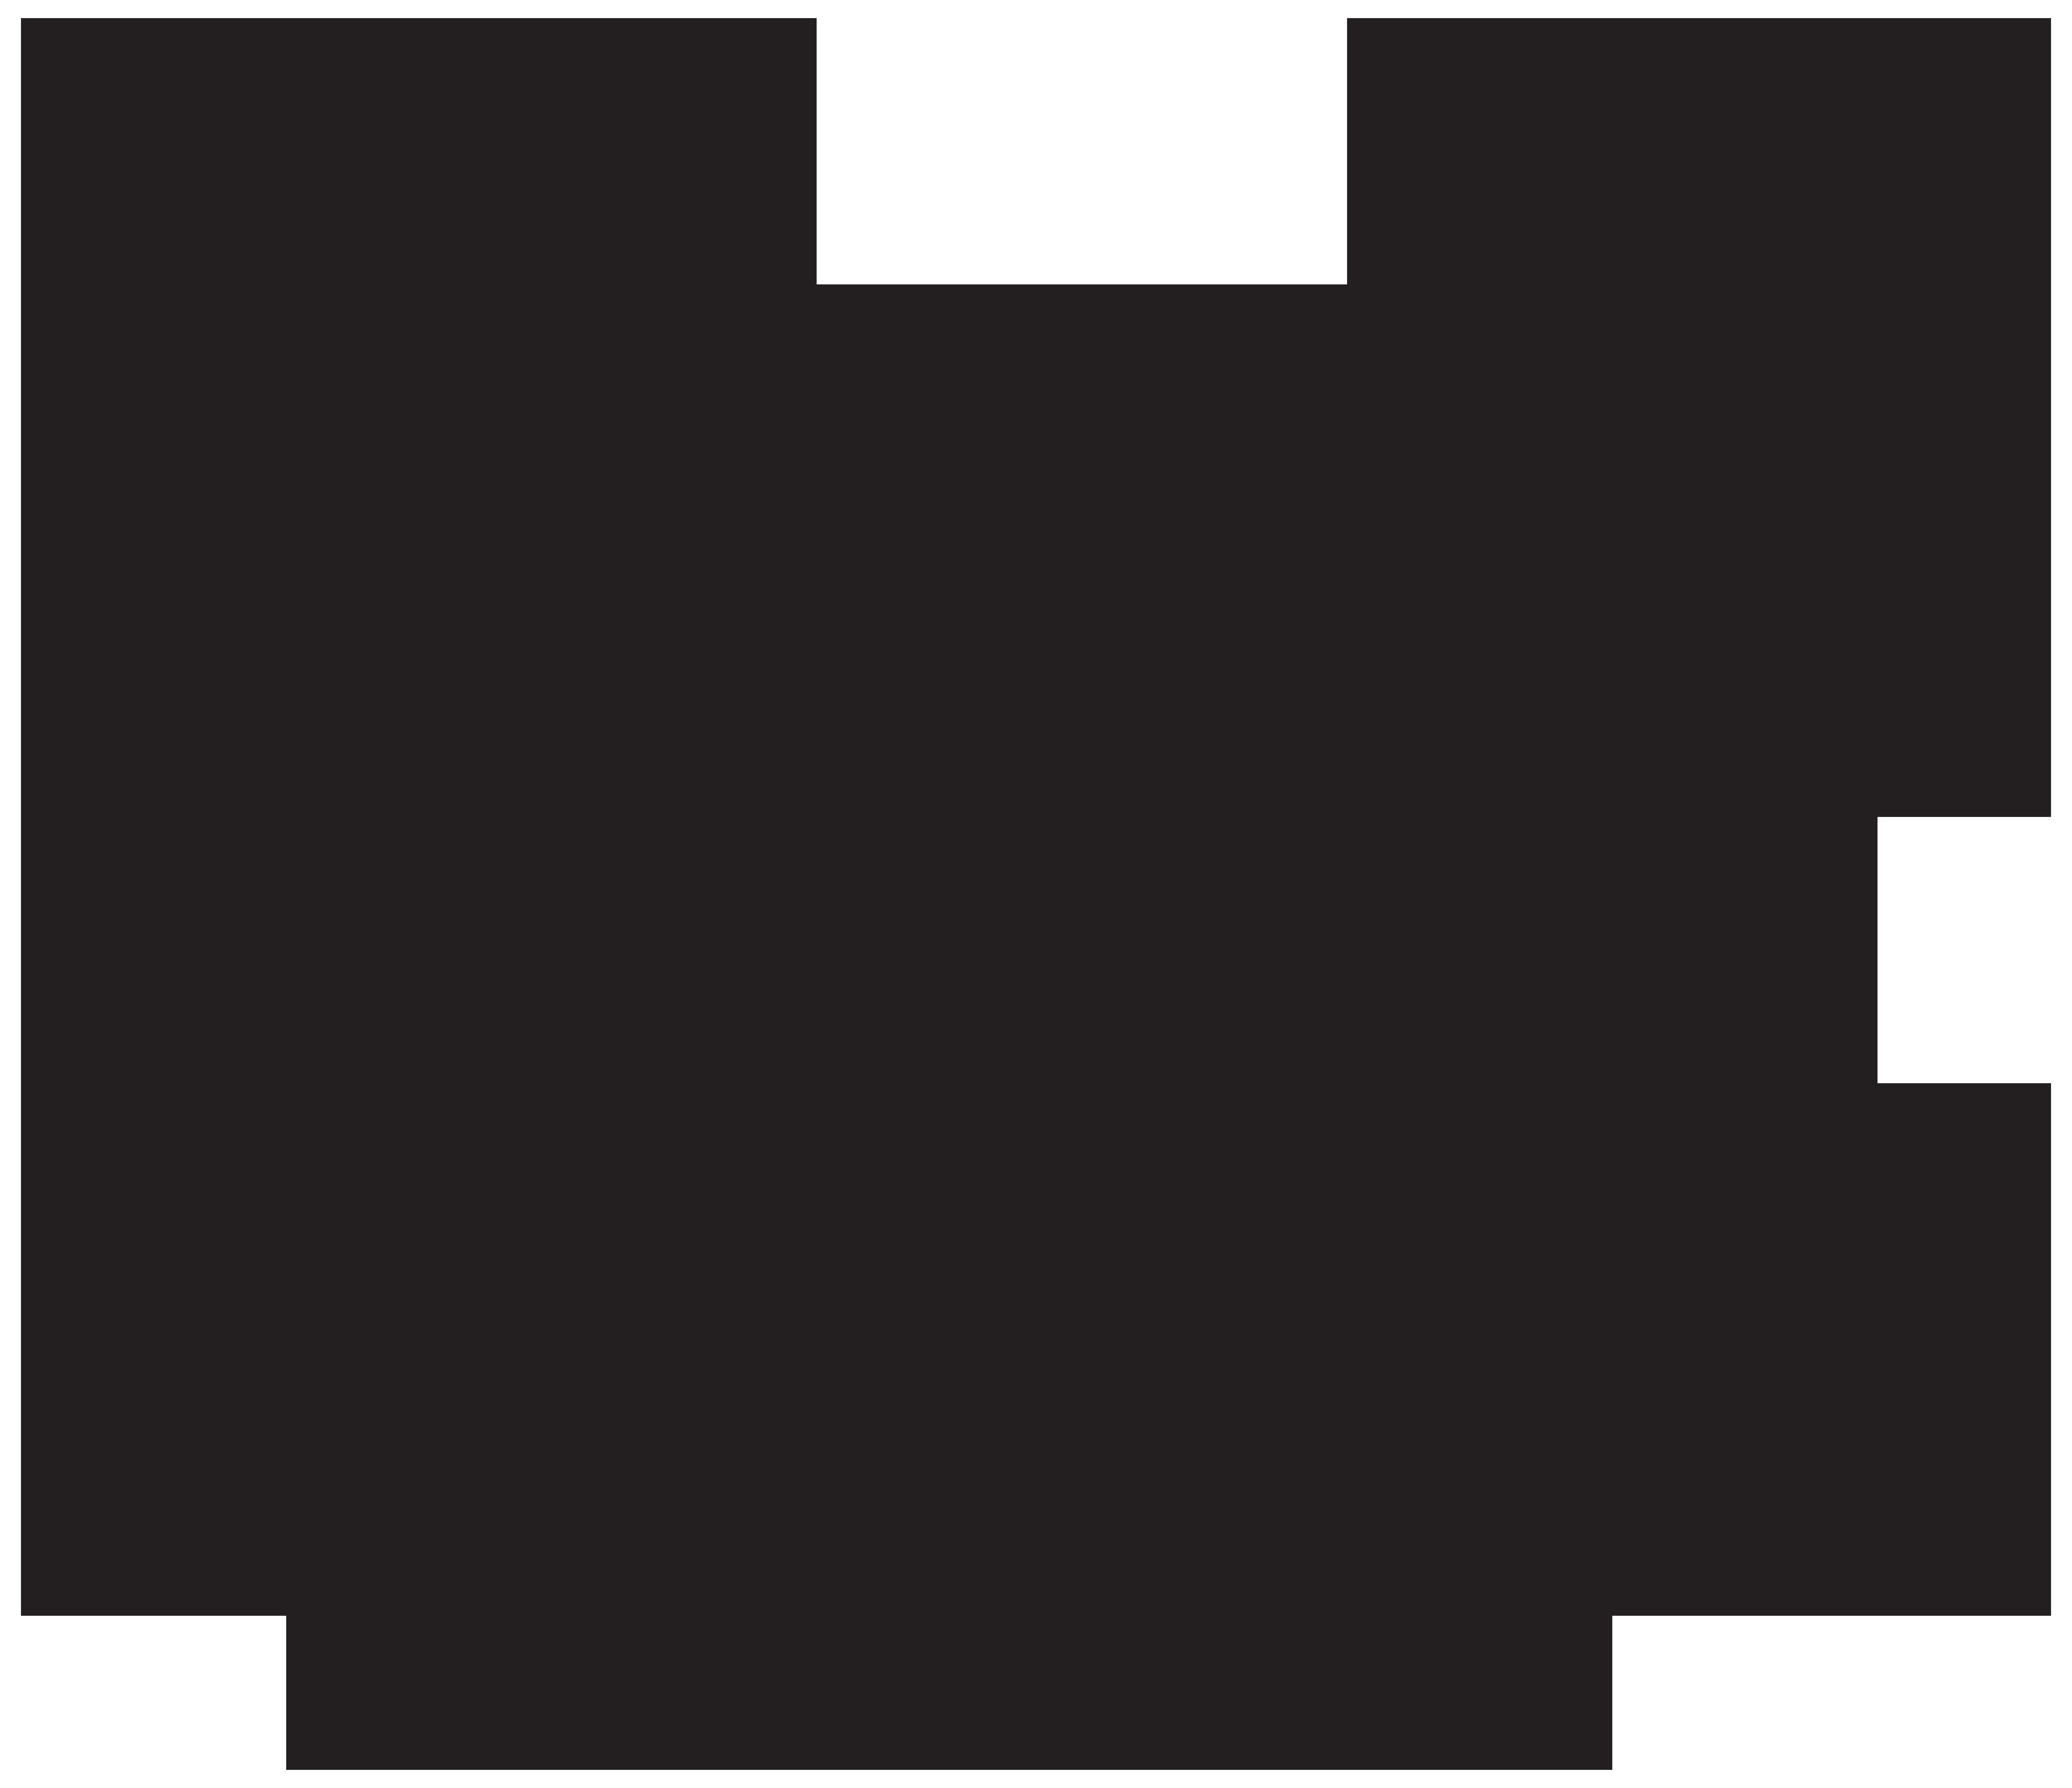 Extensions mascara clip art. Eyelash clipart eye candy